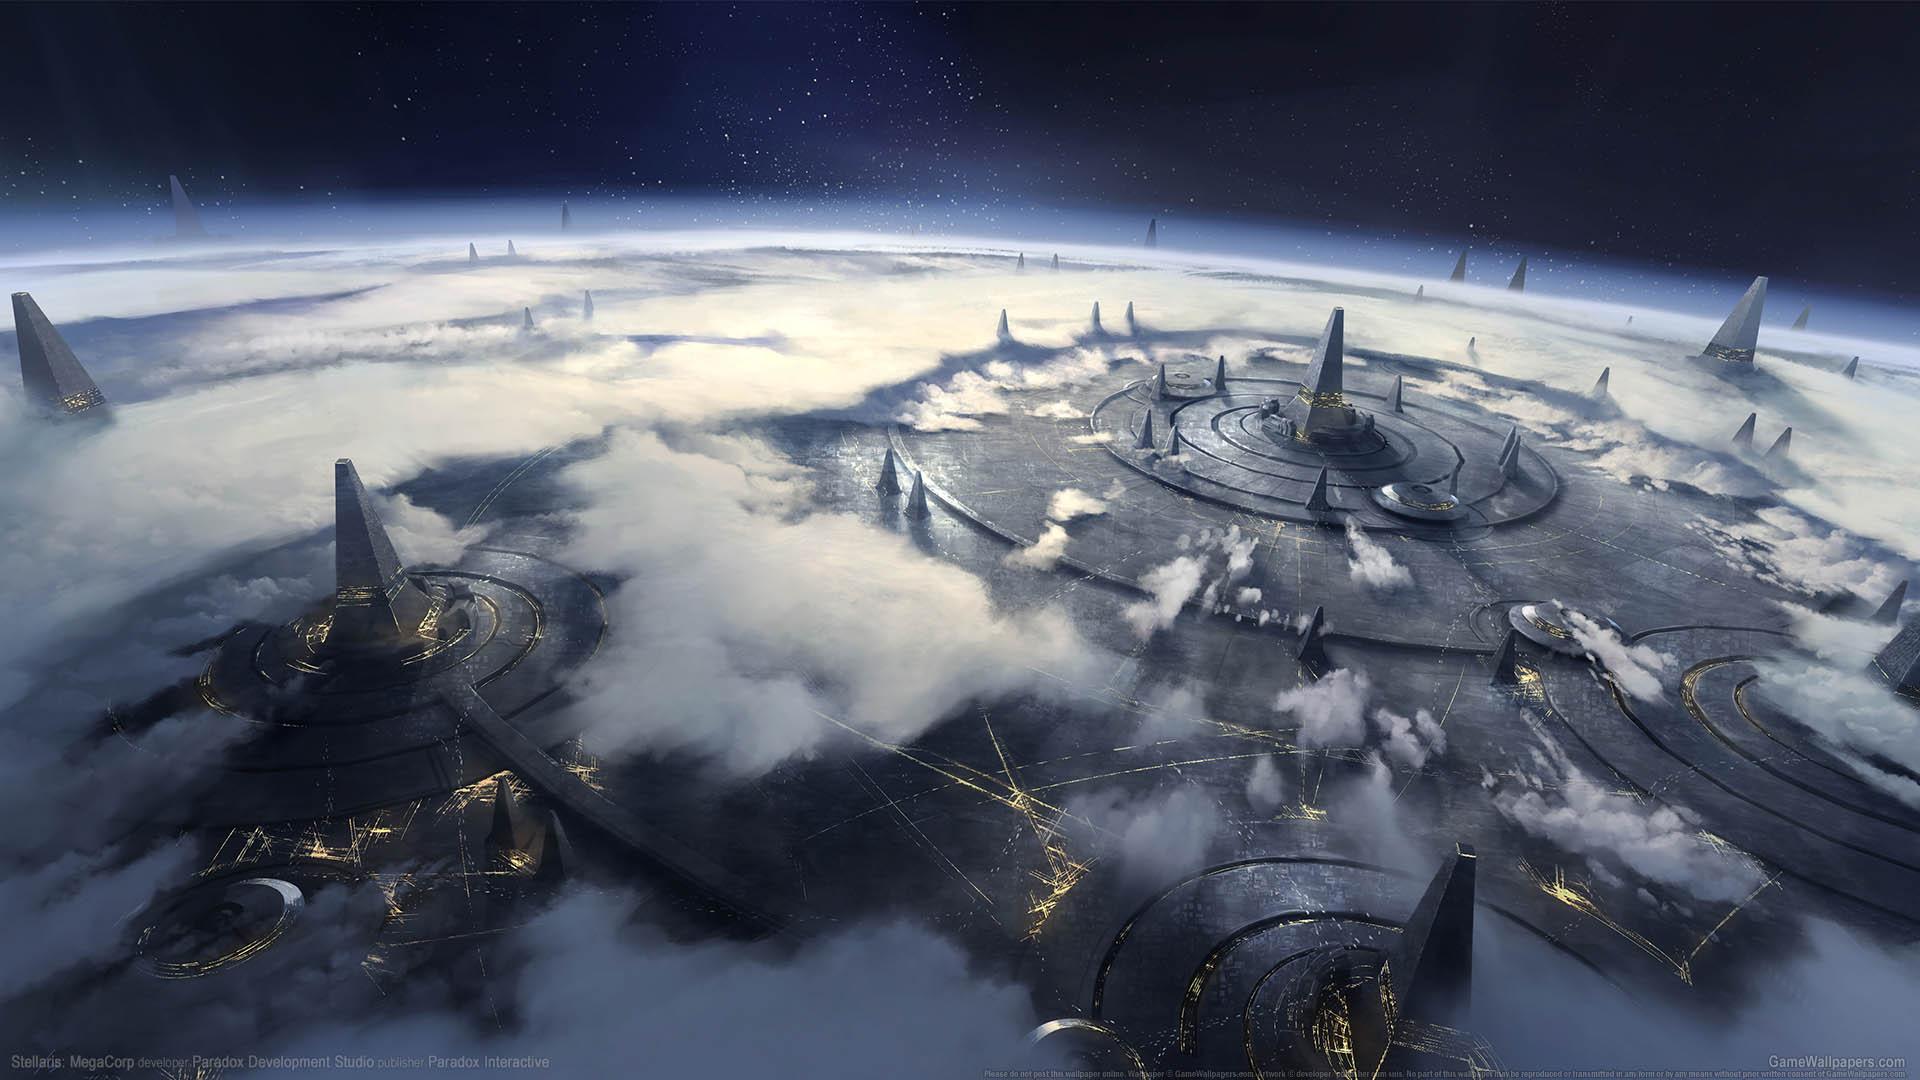 Stellaris: MegaCorp wallpaper 01 1920x1080